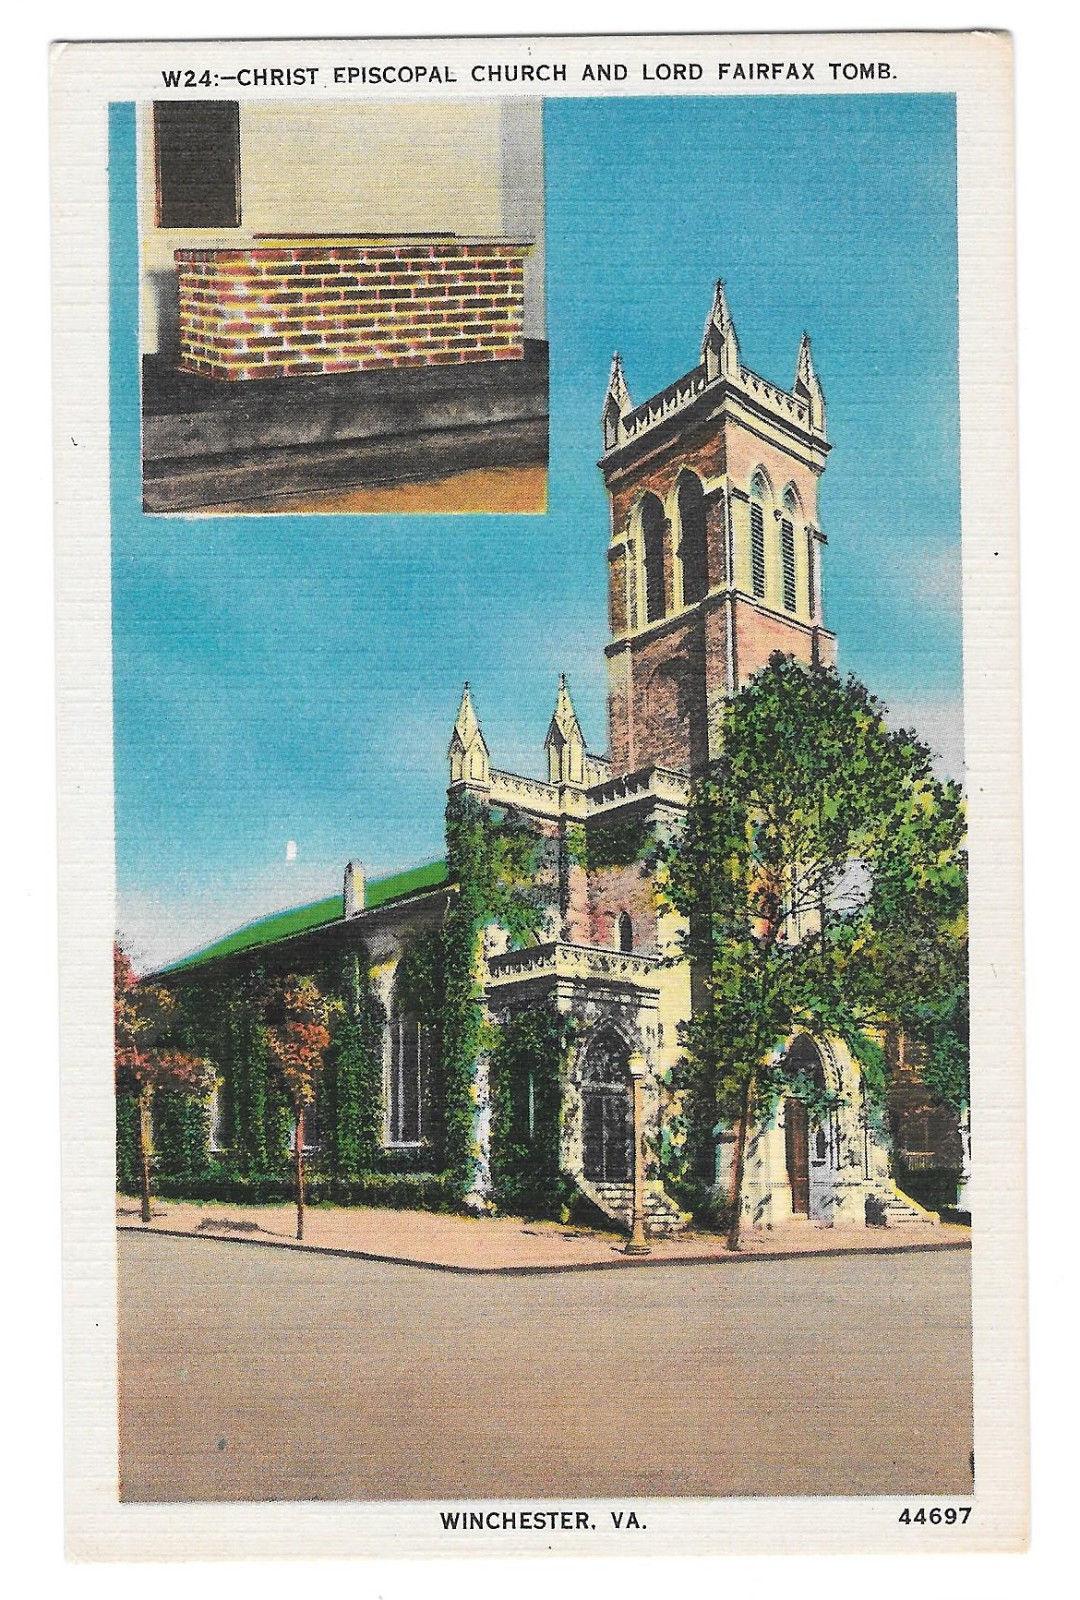 VA Winchester Christ Episcopal Church Lord Fairfax Tomb Vtg Linen Postcard